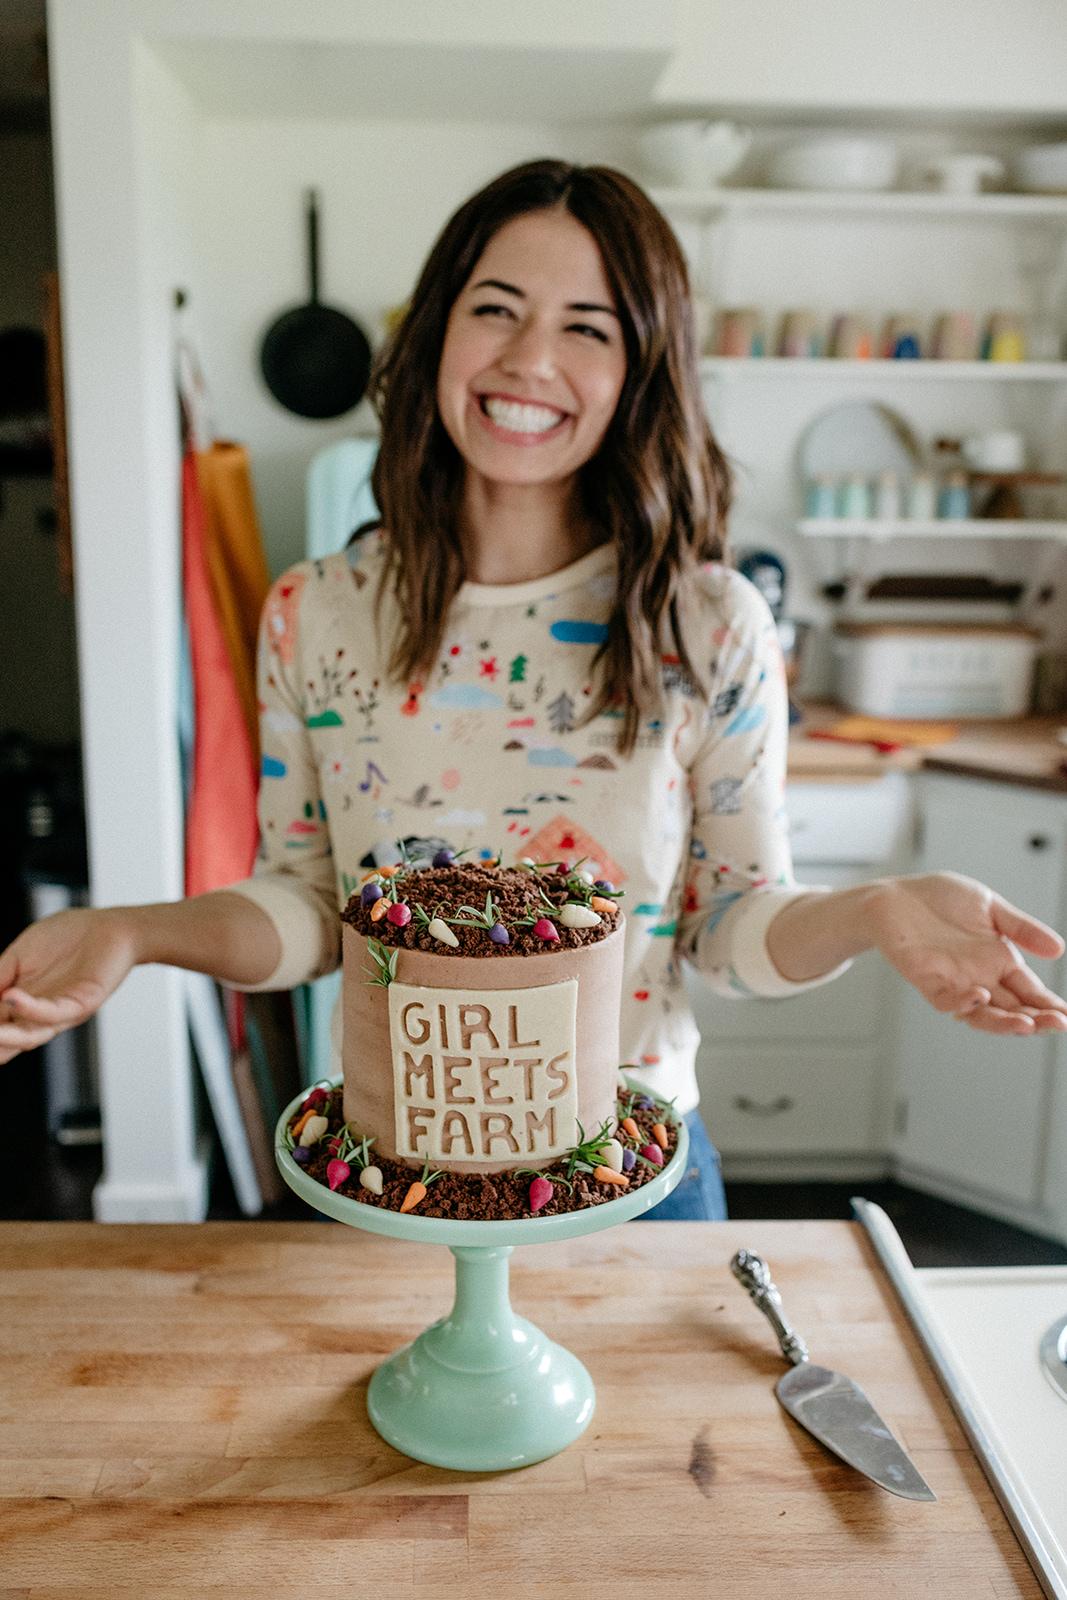 molly-yeh-girl-meets-farm-cake-8.jpg